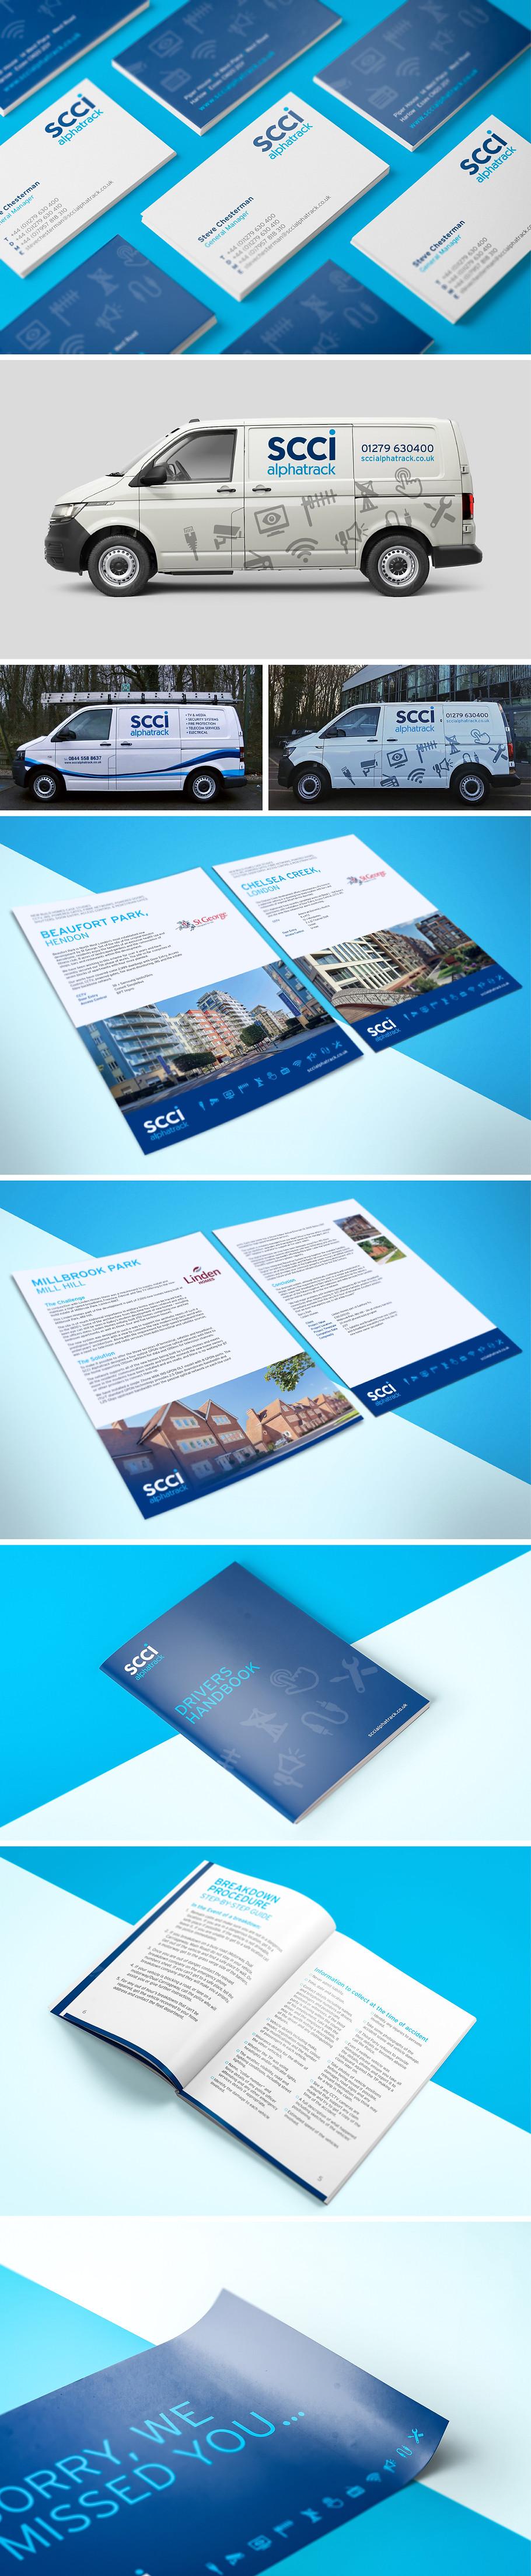 KOM Design | SCCi